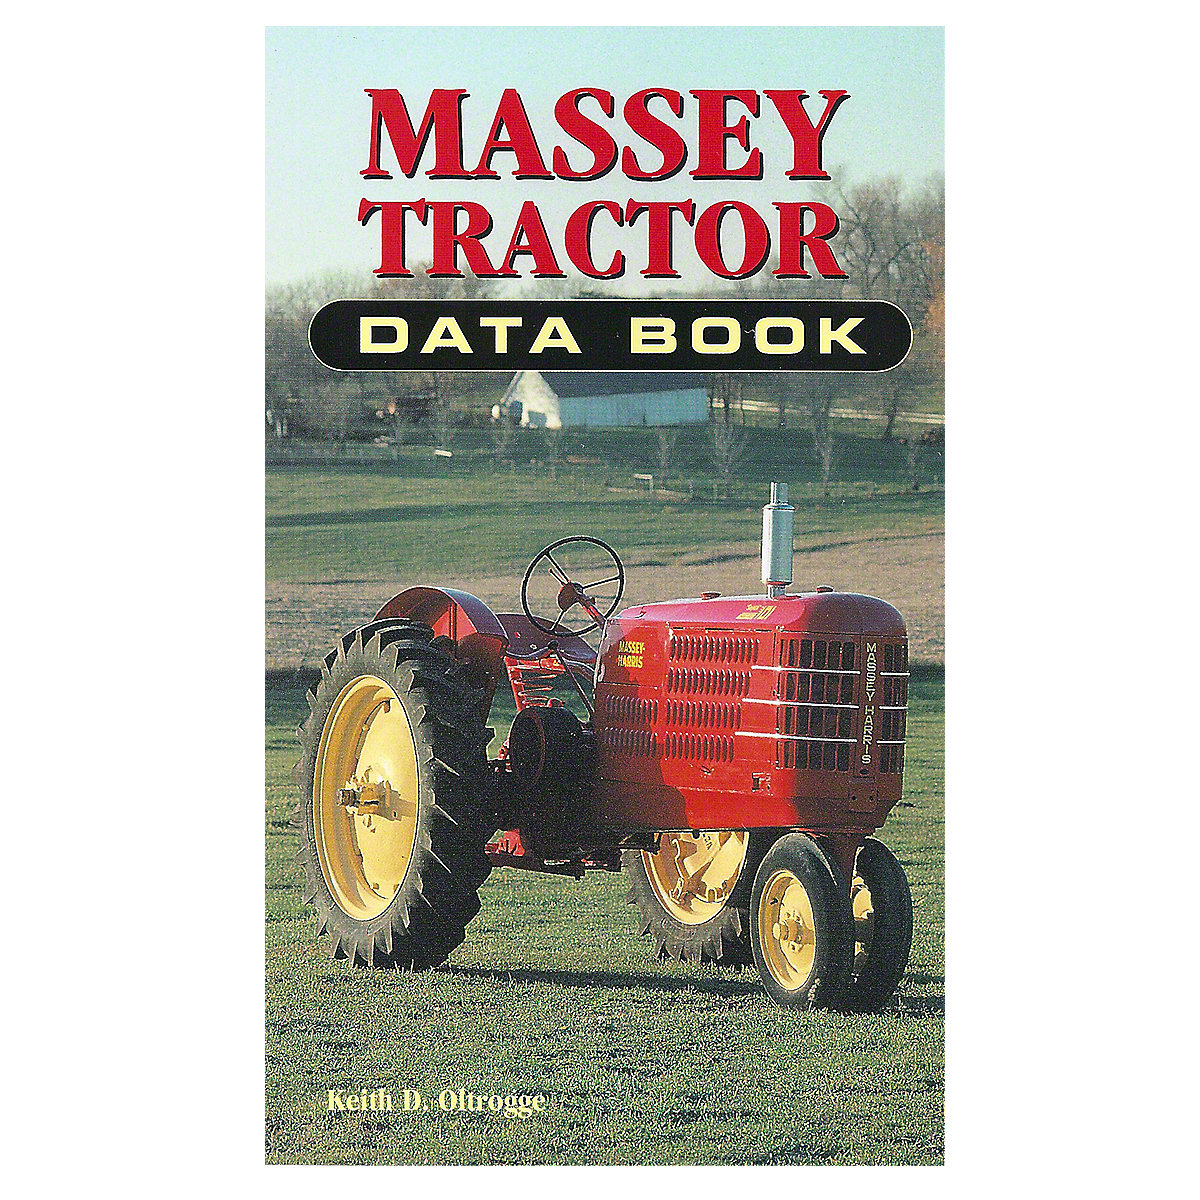 Massey Tractor Data Book.